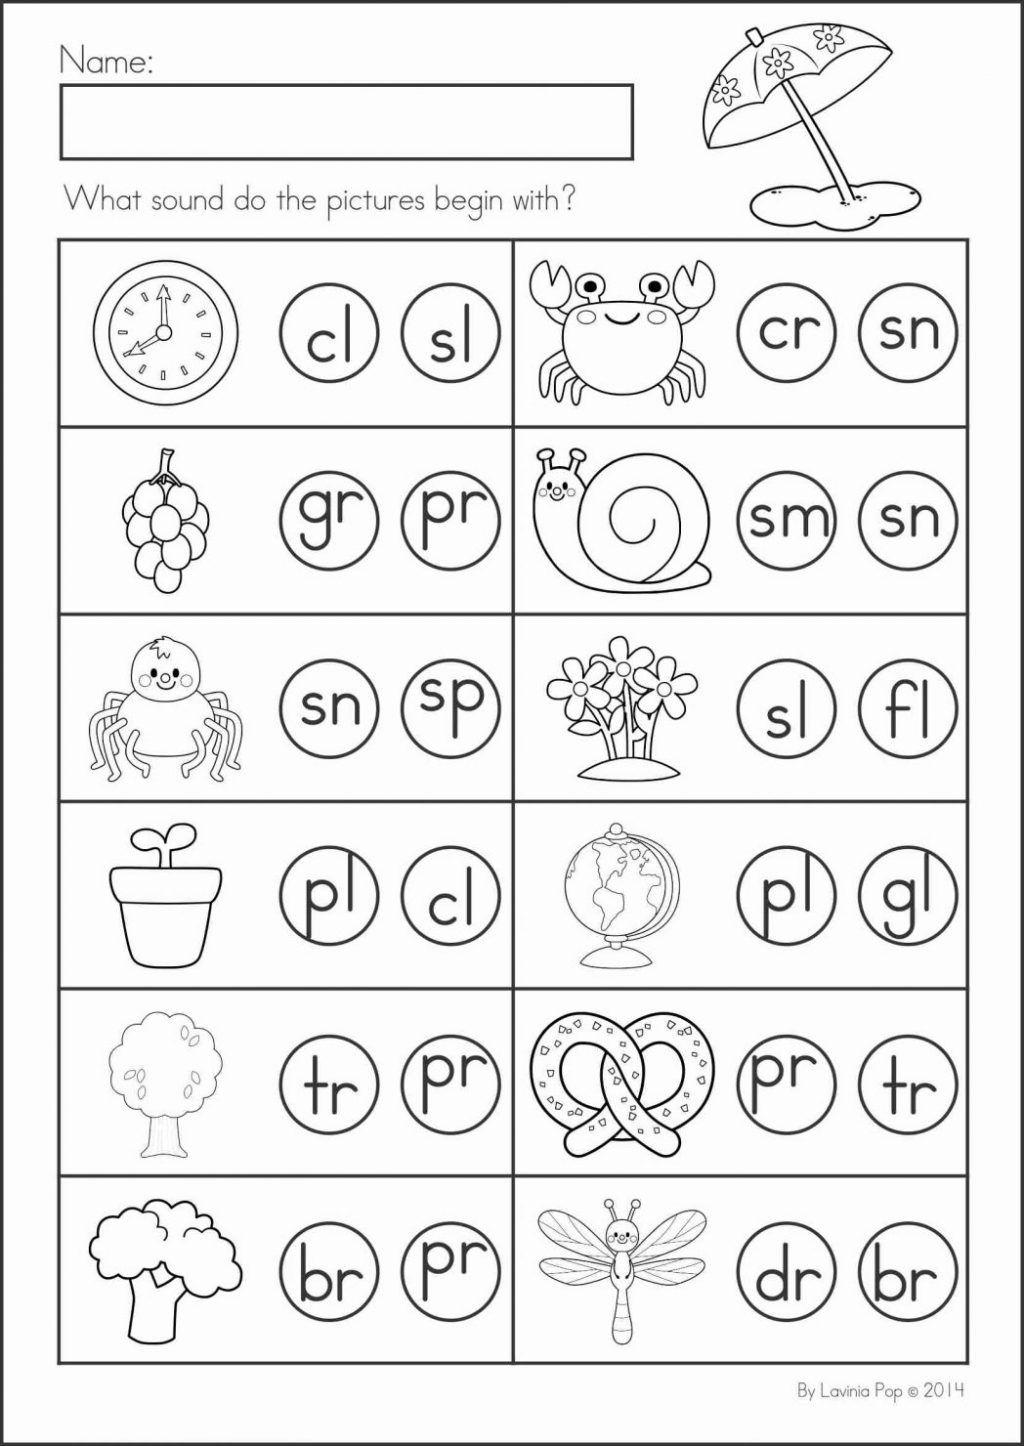 Consonant Blends Worksheets For Kindergarten